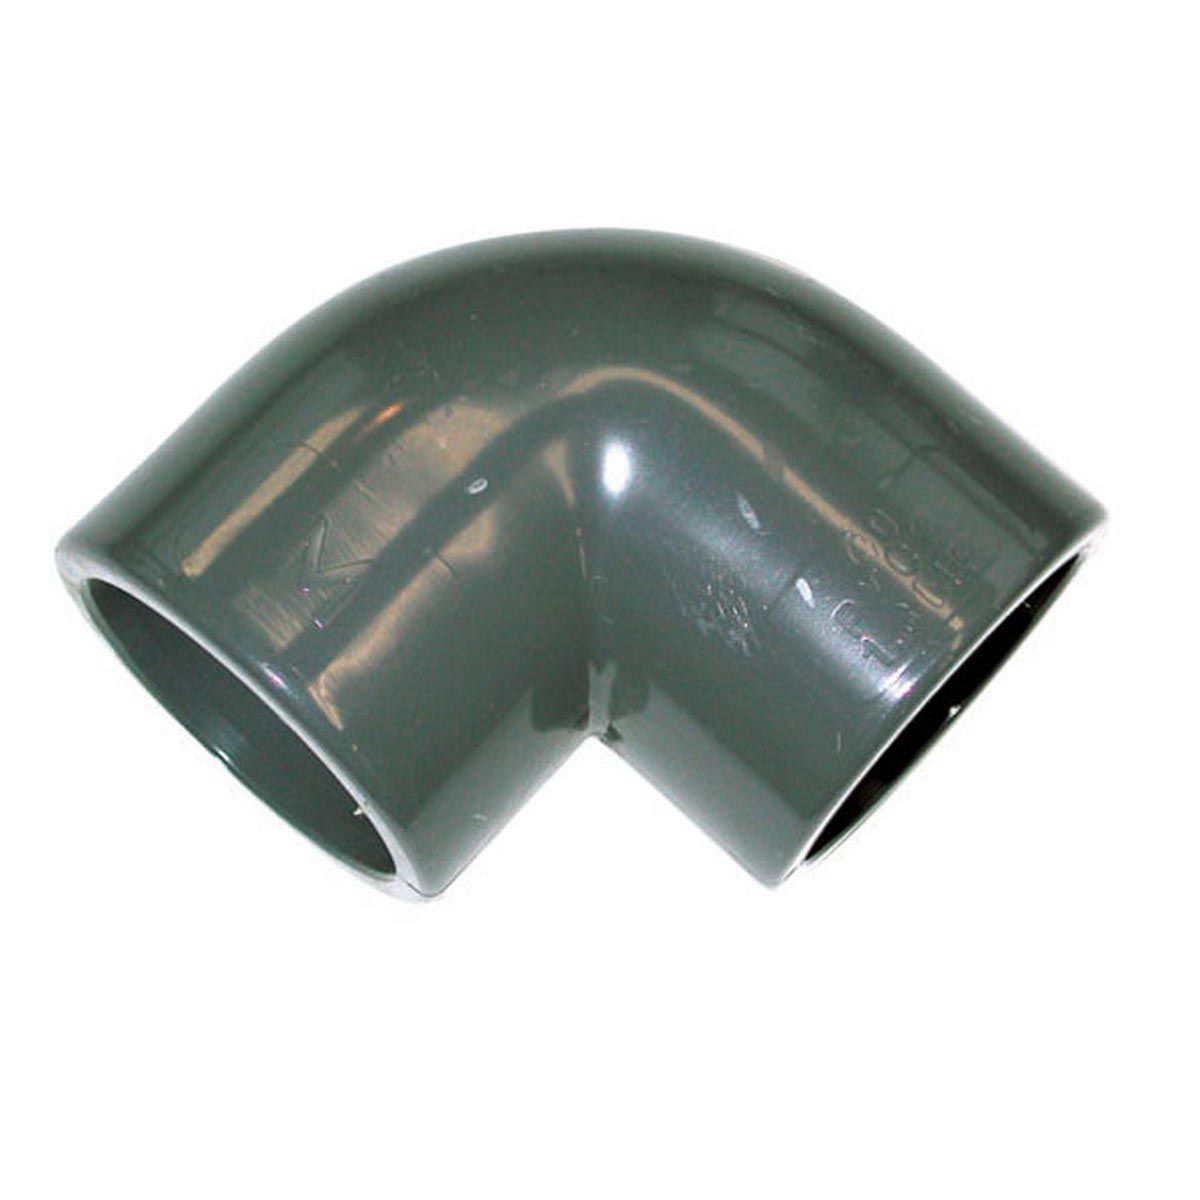 Winkel 90° zum Kleben, aus PVC, grau, d 16 mm, PN 16